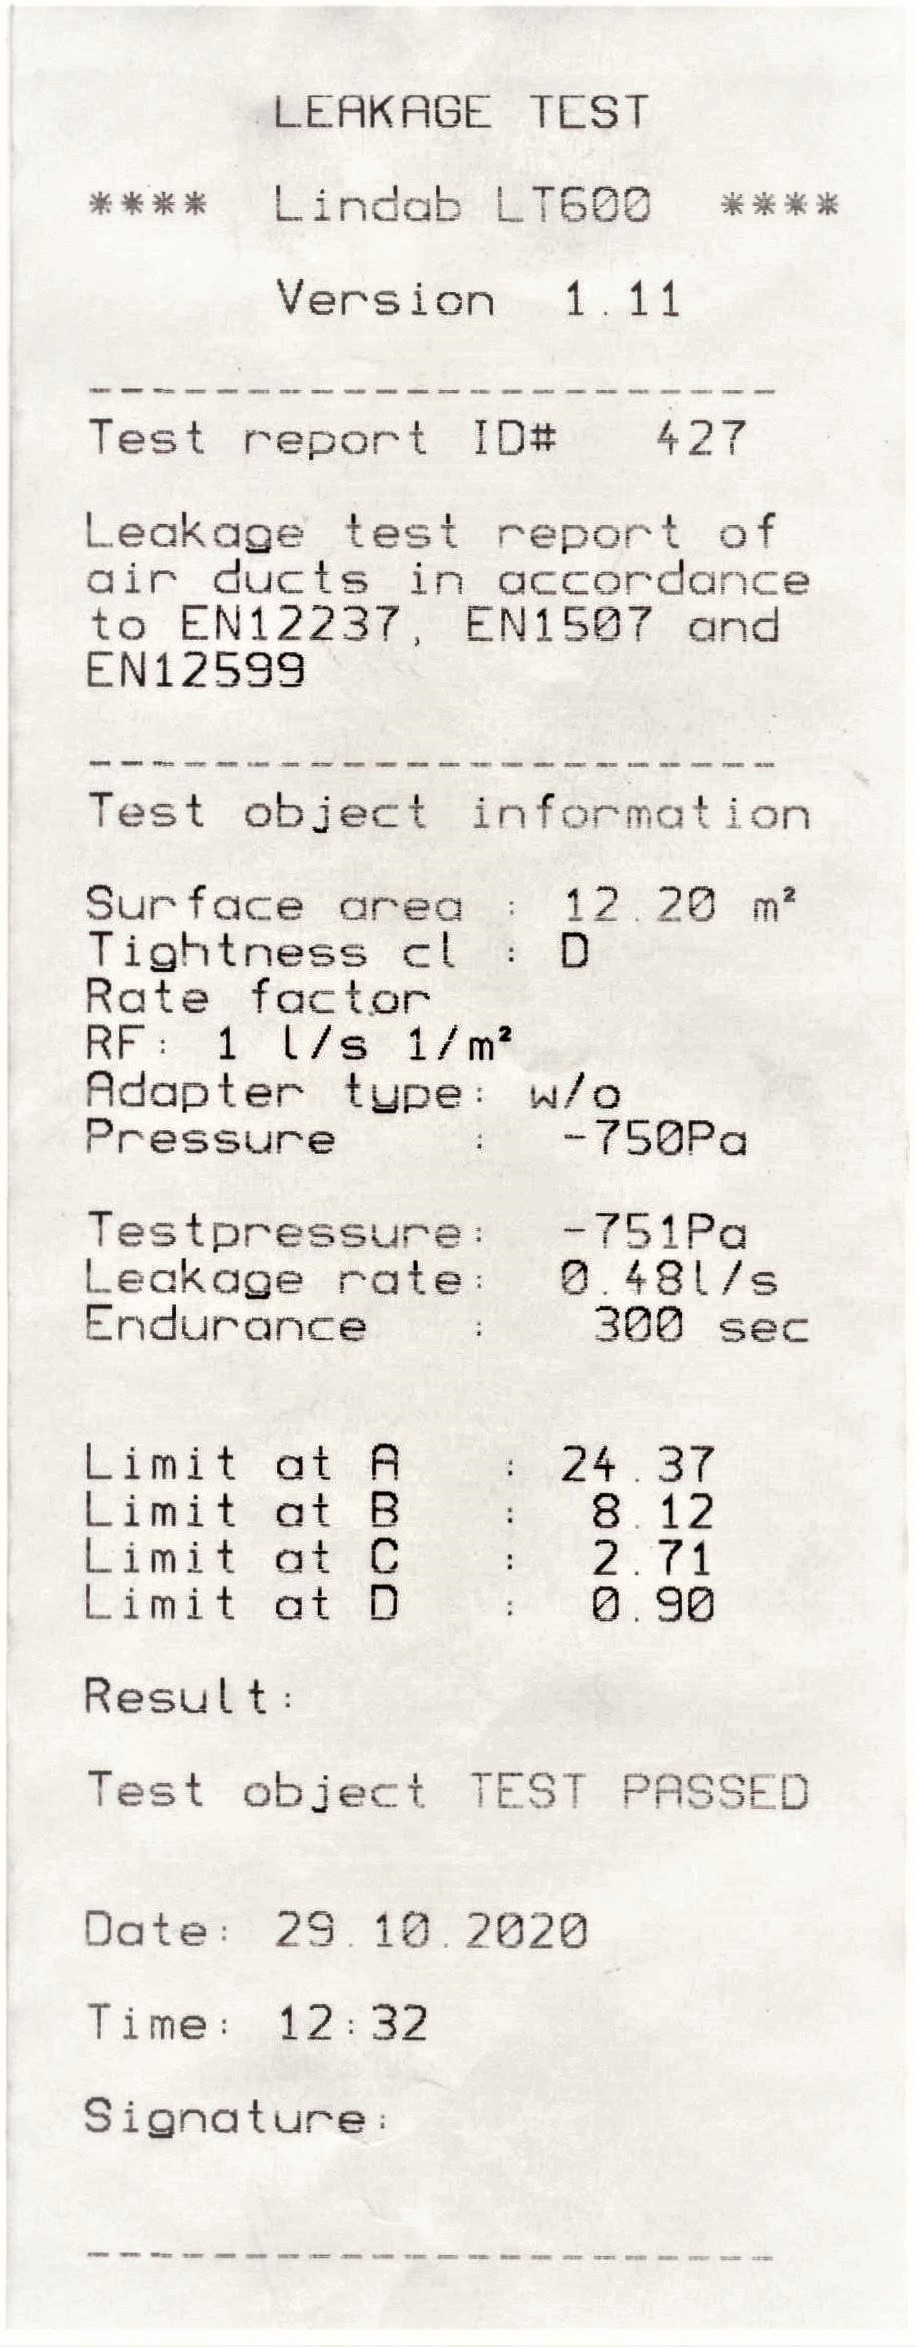 Test 2 passed 750 nivel D